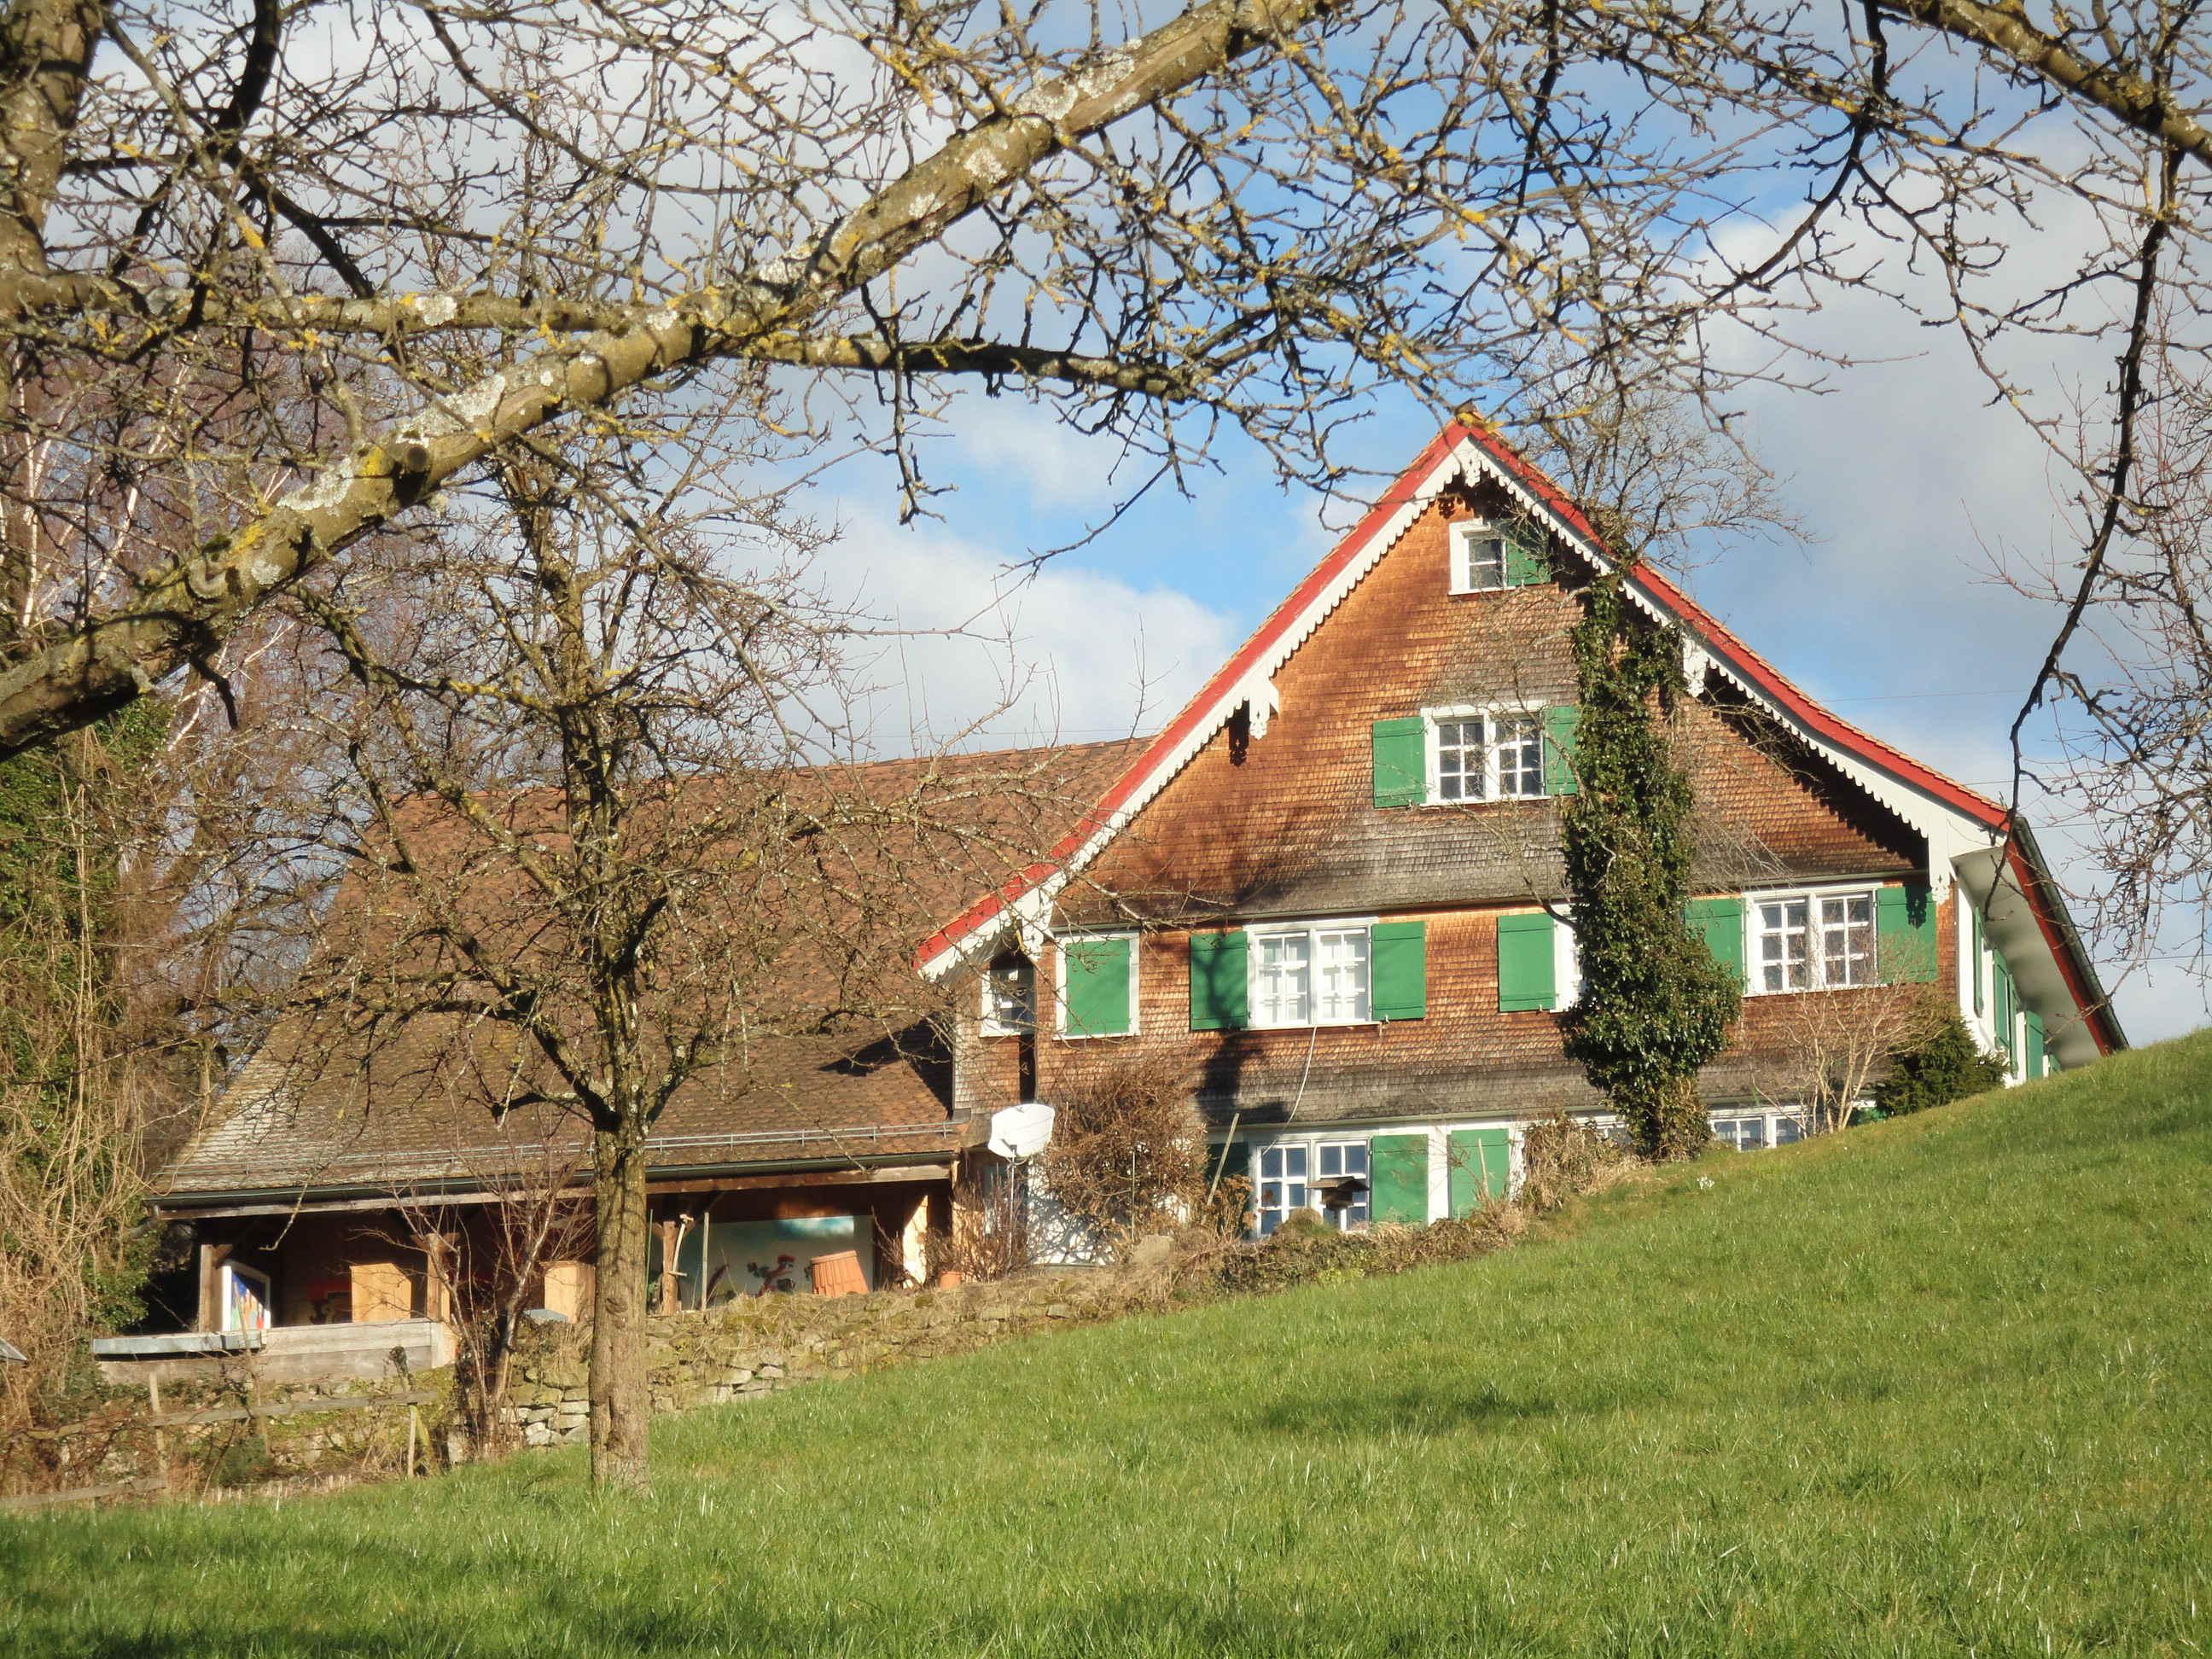 Heldsberg